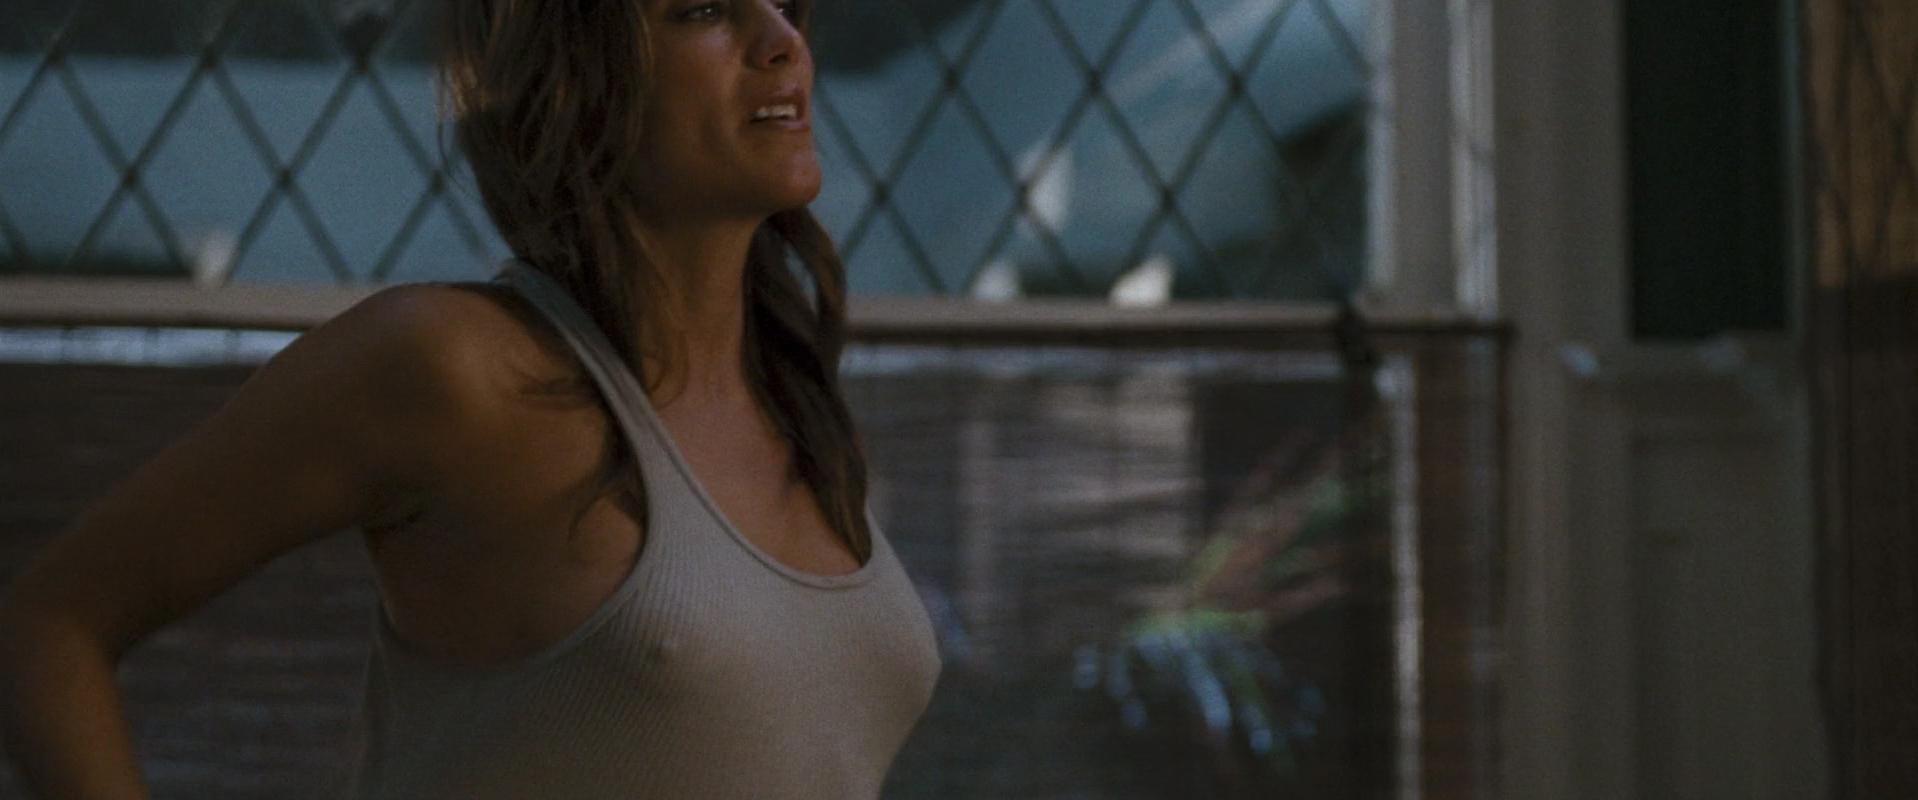 Rosamund pike breast tits